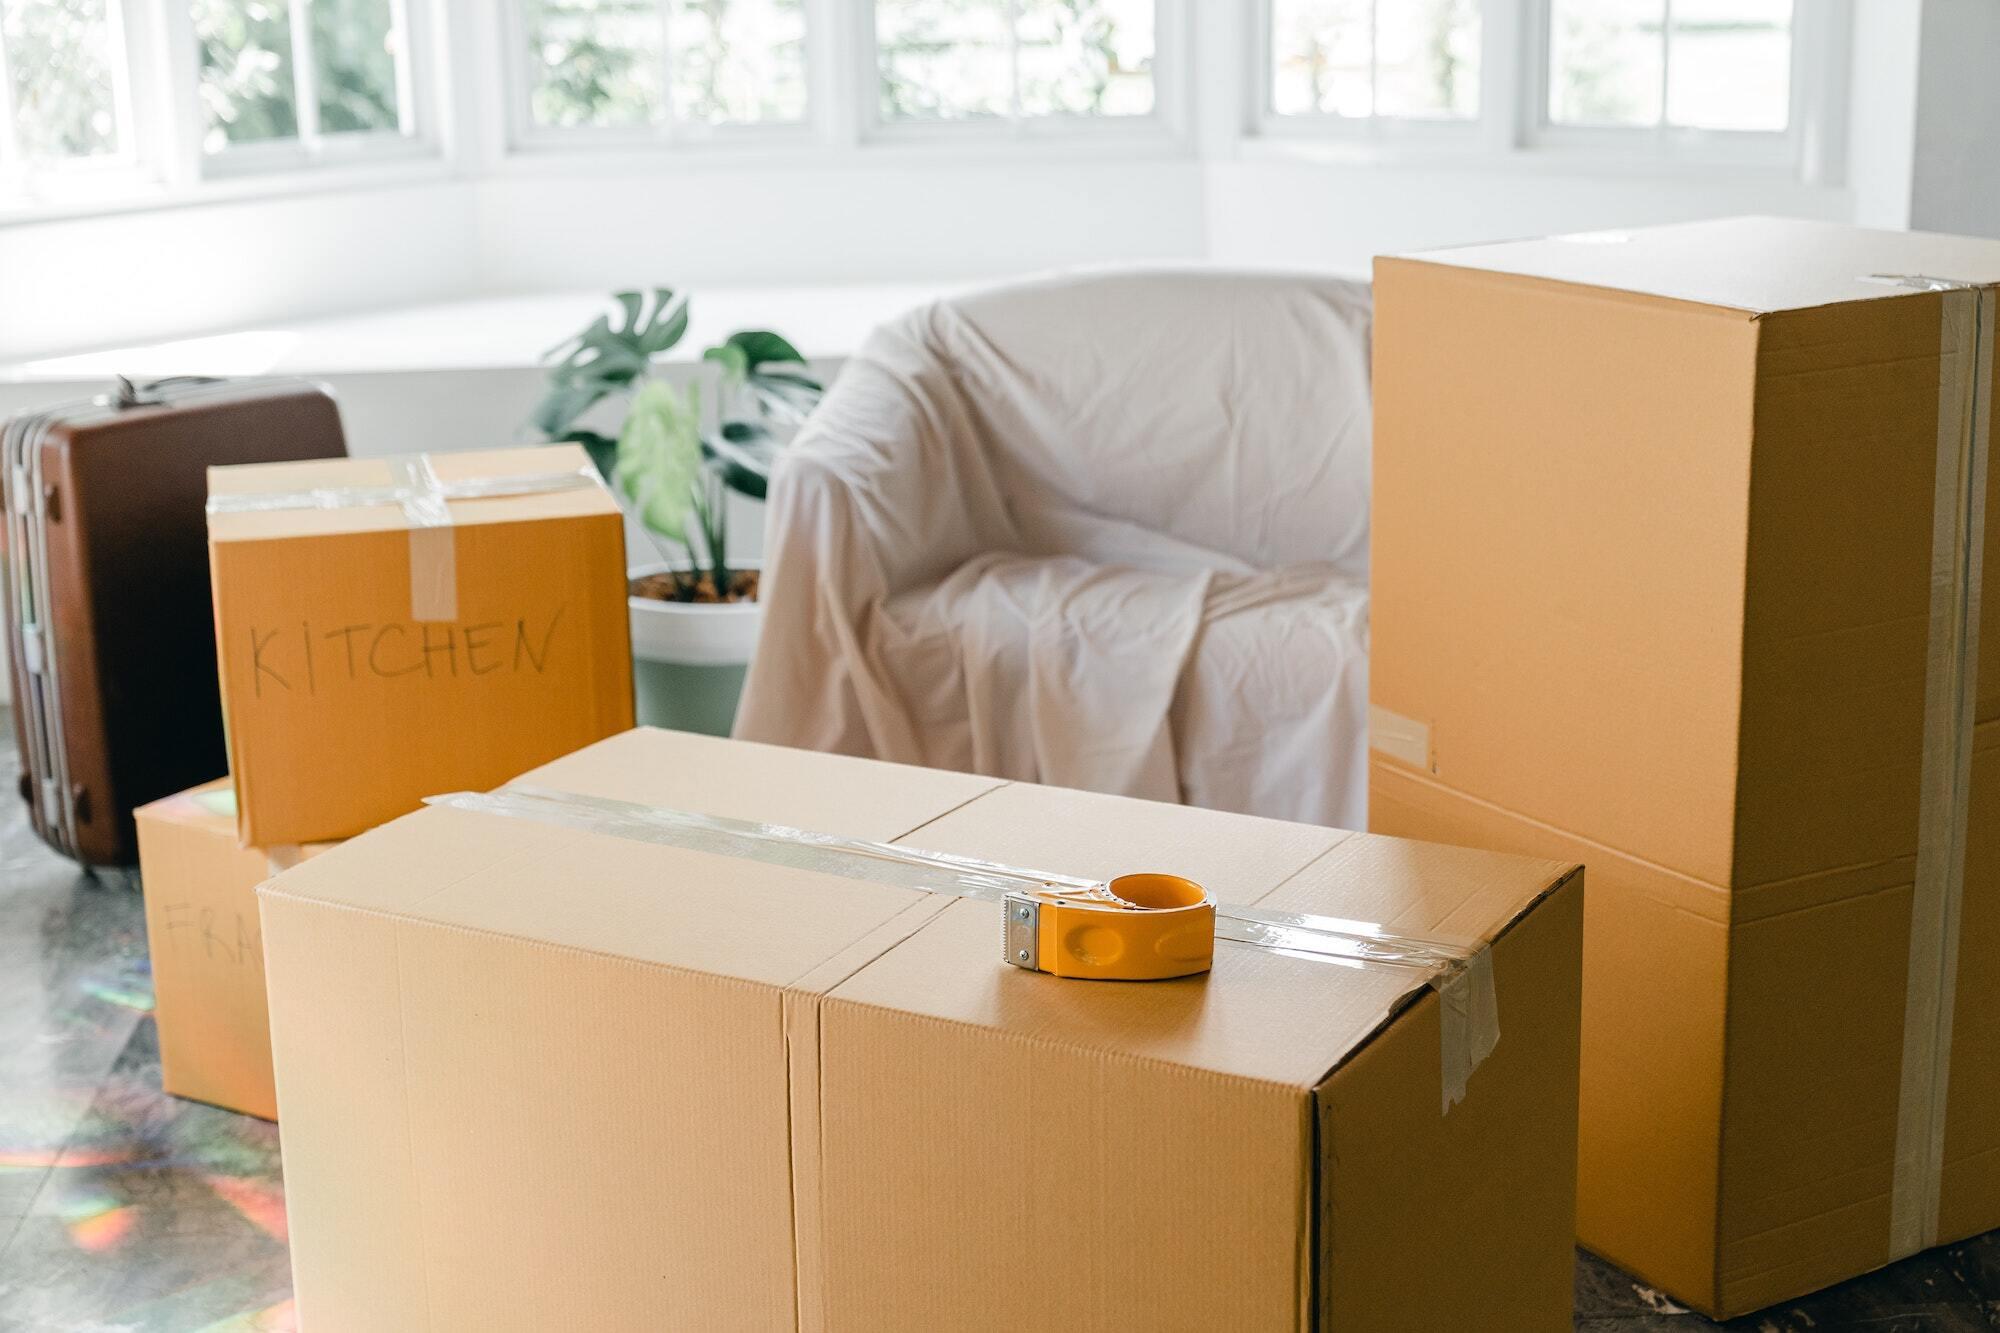 Des cartons de déménagement neufs